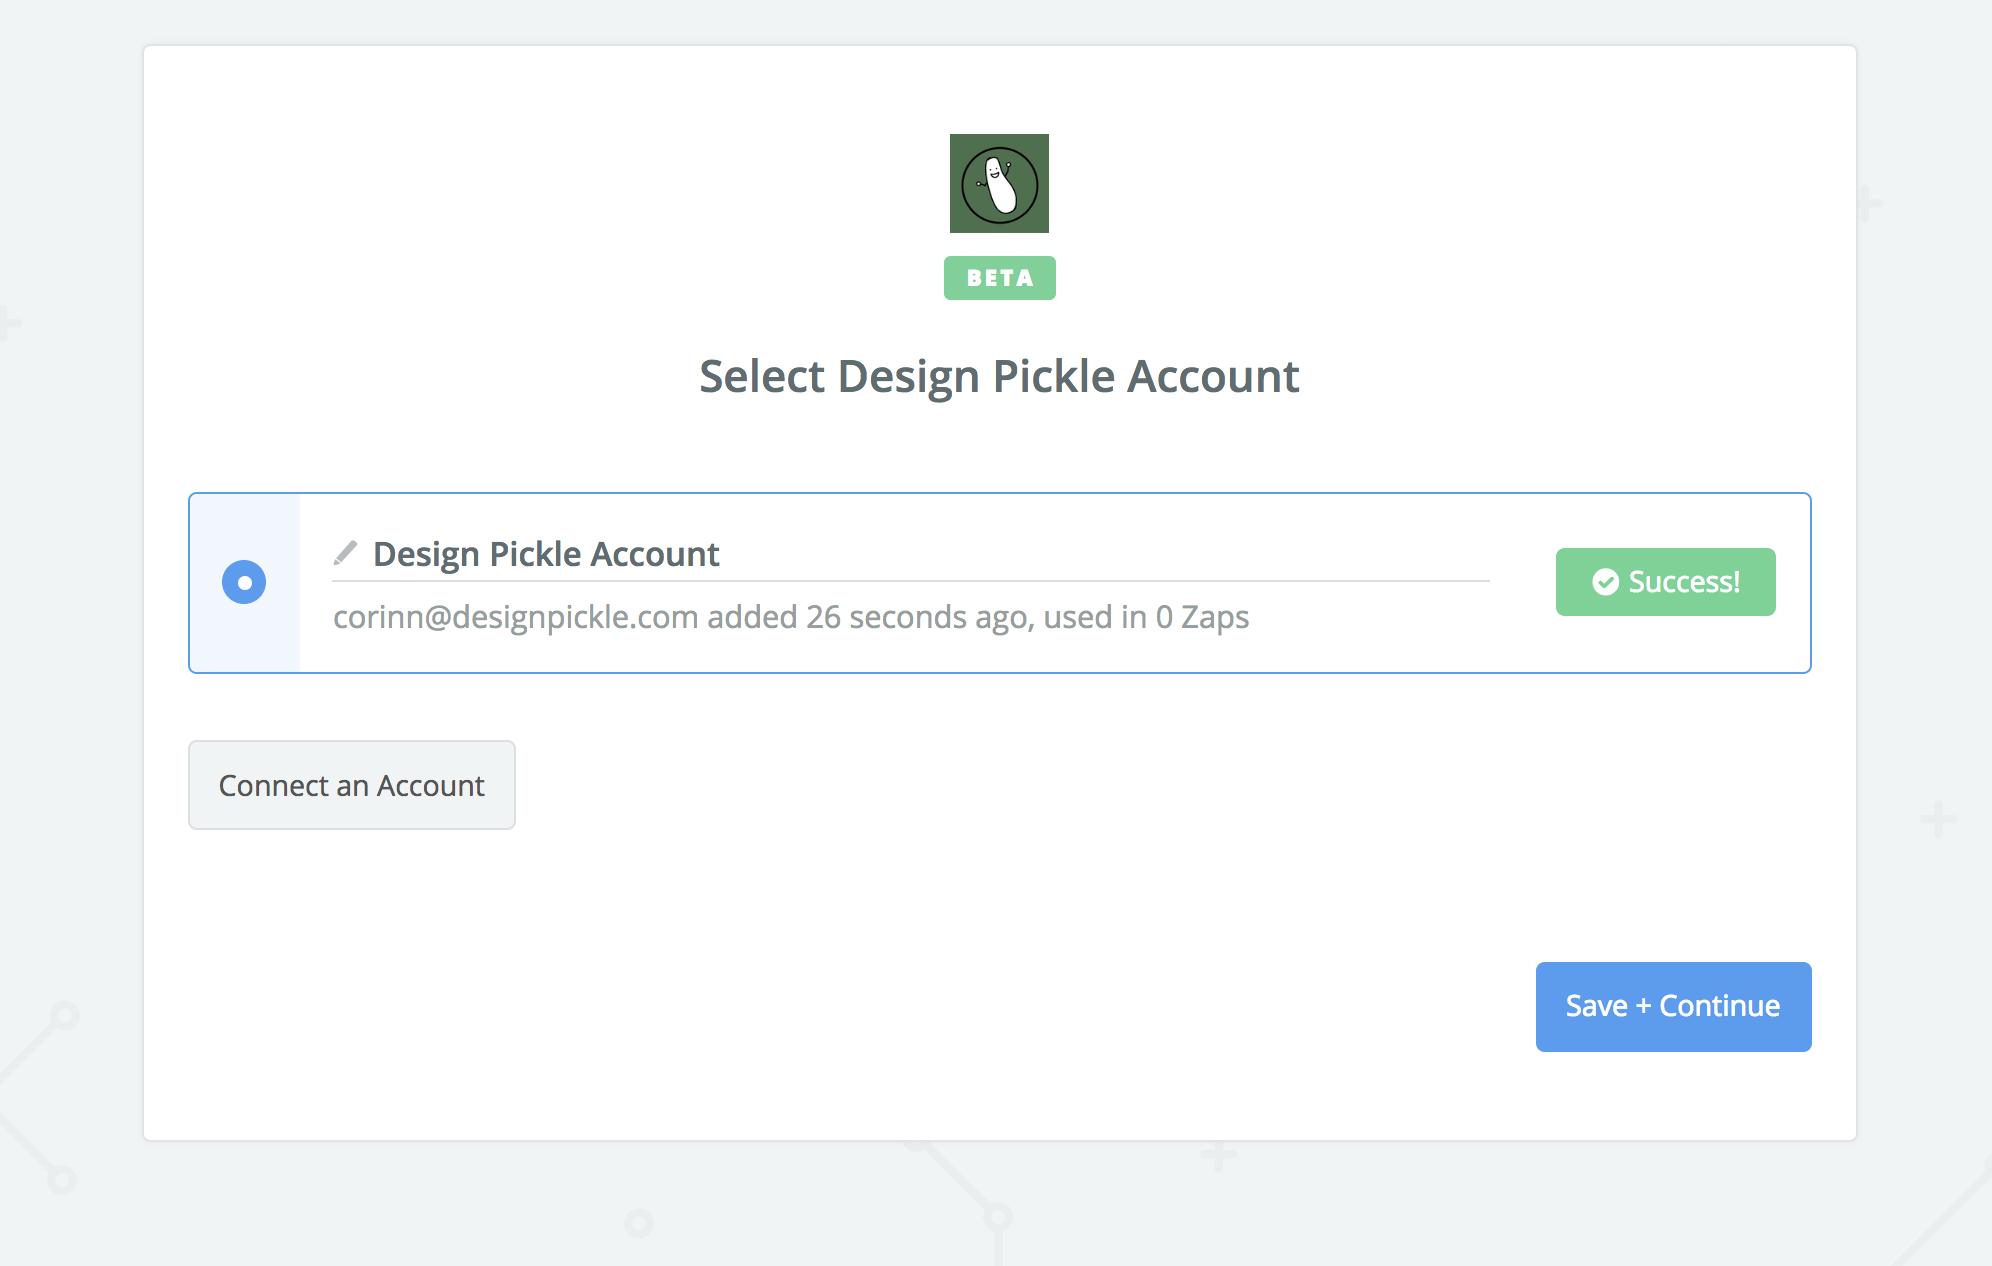 Design Pickle connection successful